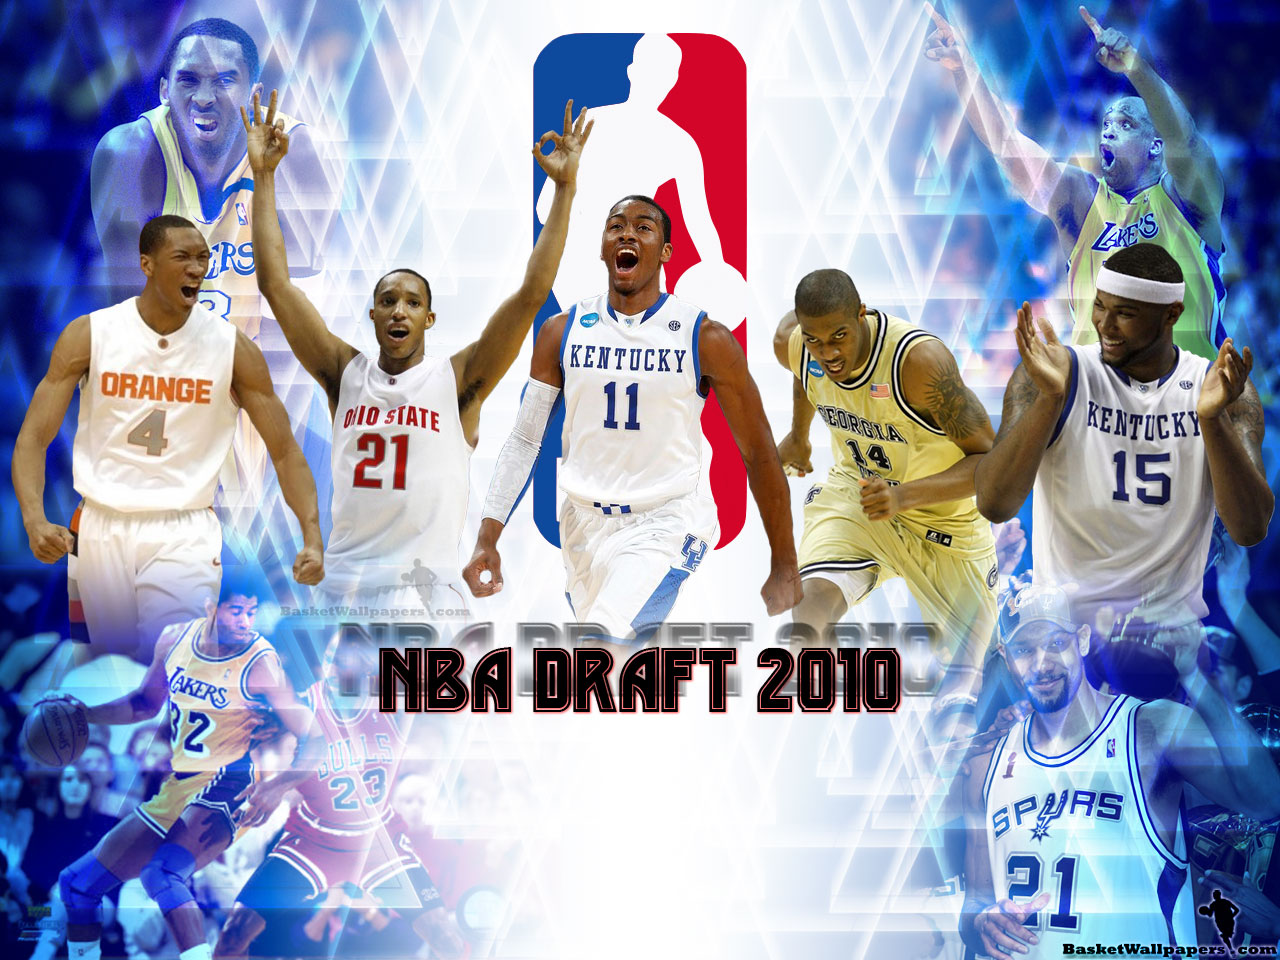 Nba Draft 2010 Top 5 Picks Wallpaper Basketball Wallpapers At Basketwallpapers Com